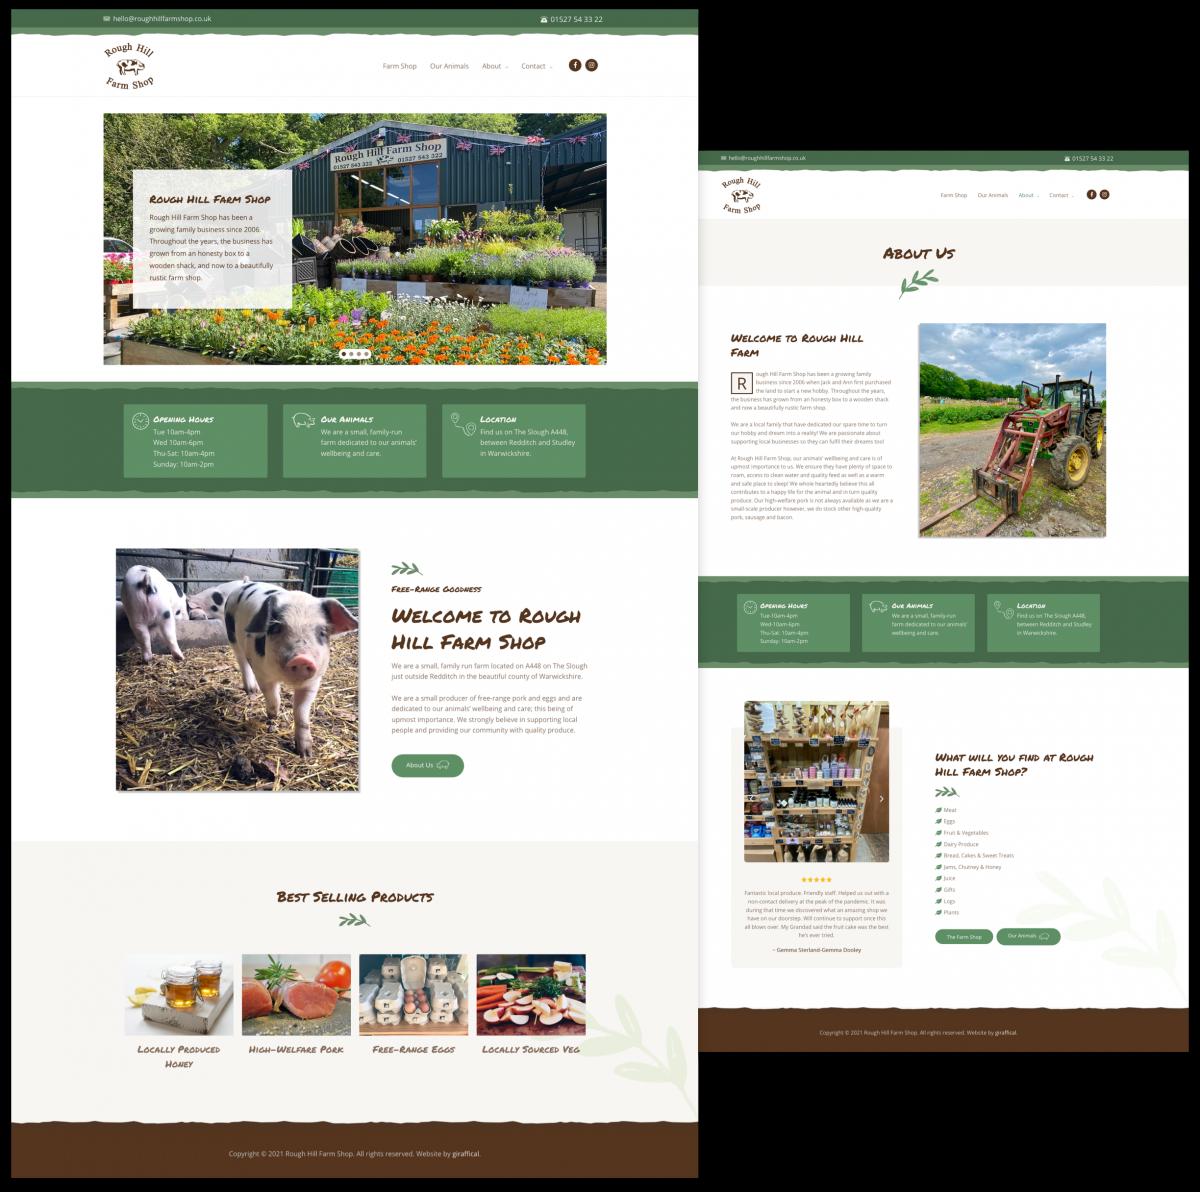 Farm Shop Website Design - Rough Hill Farm